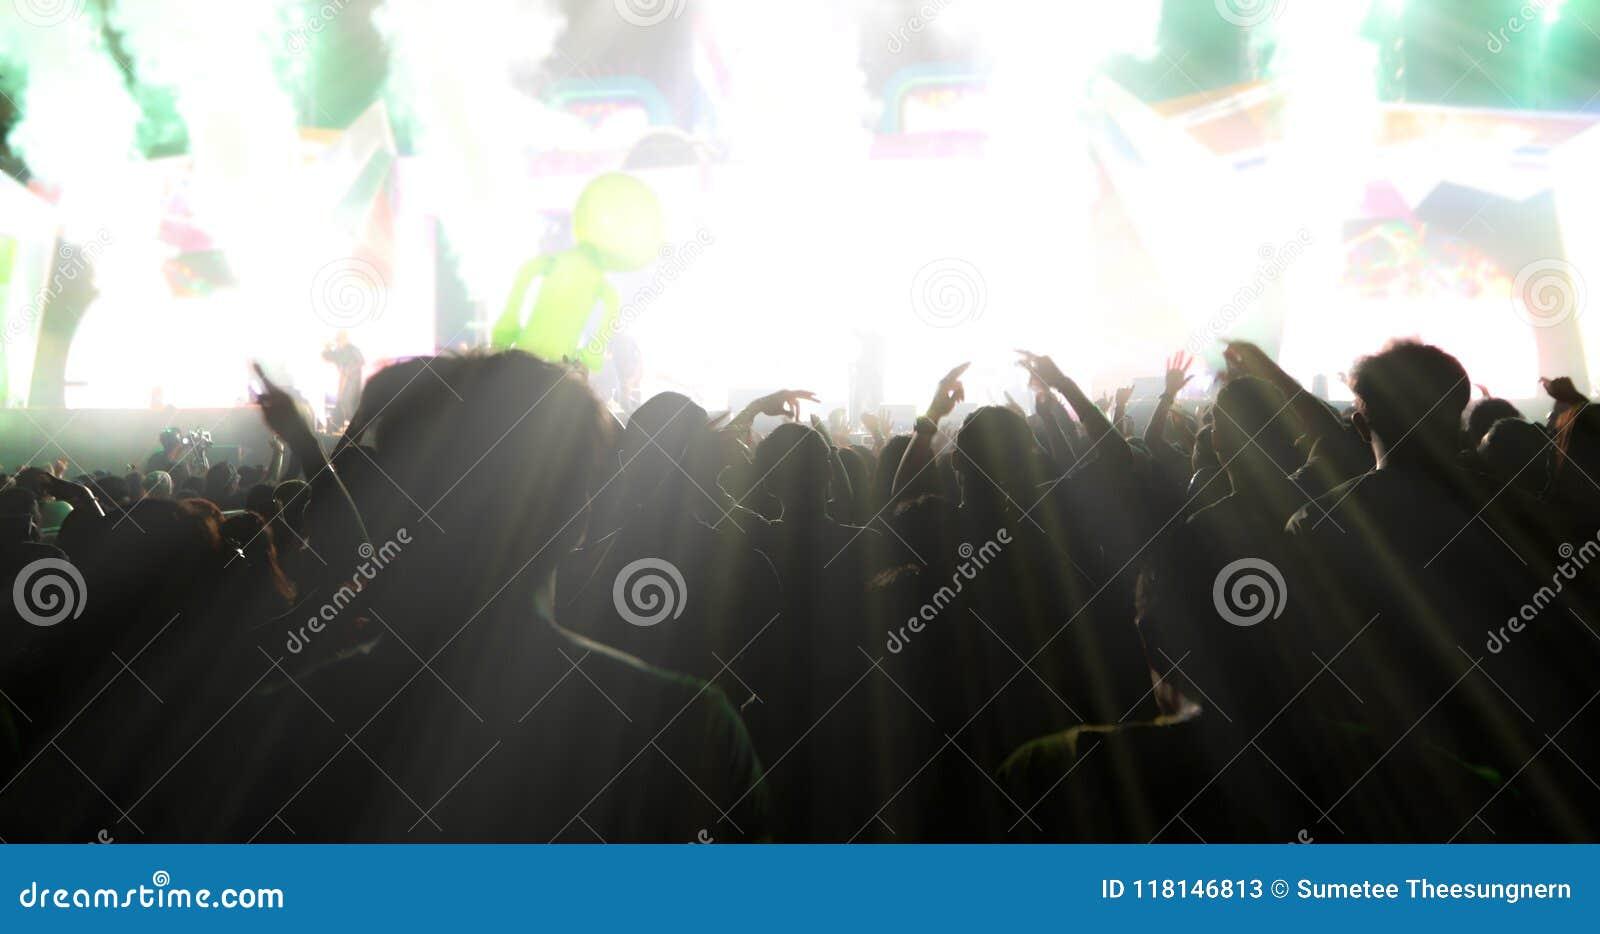 Obscuro das silhuetas da multidão do concerto na ideia traseira do festival